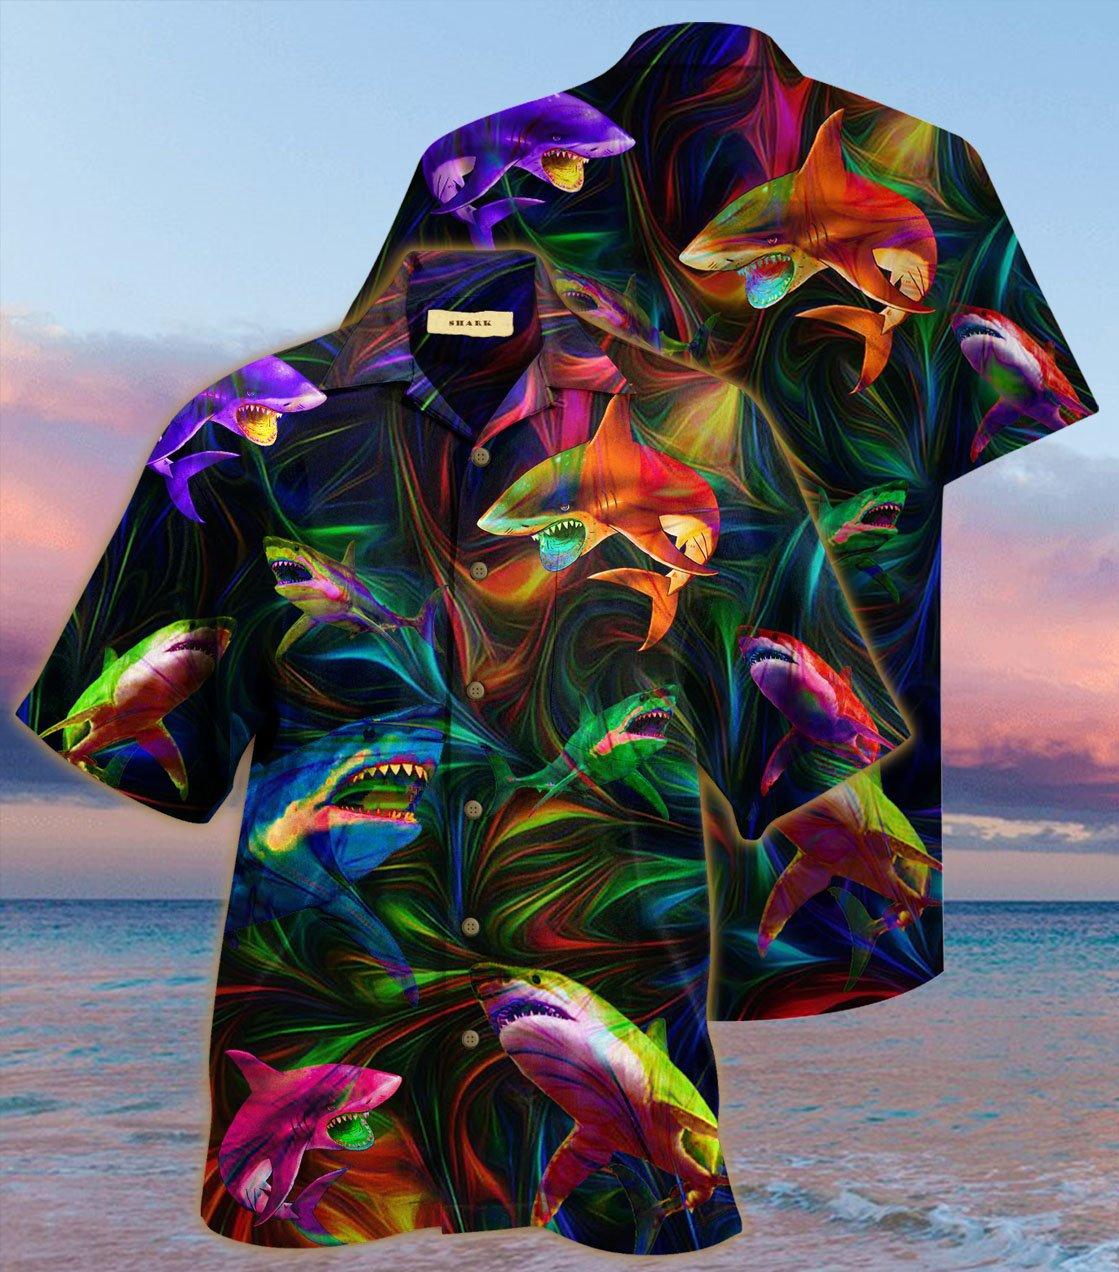 [special edition] colorful shark hawaiian shirt - Maria